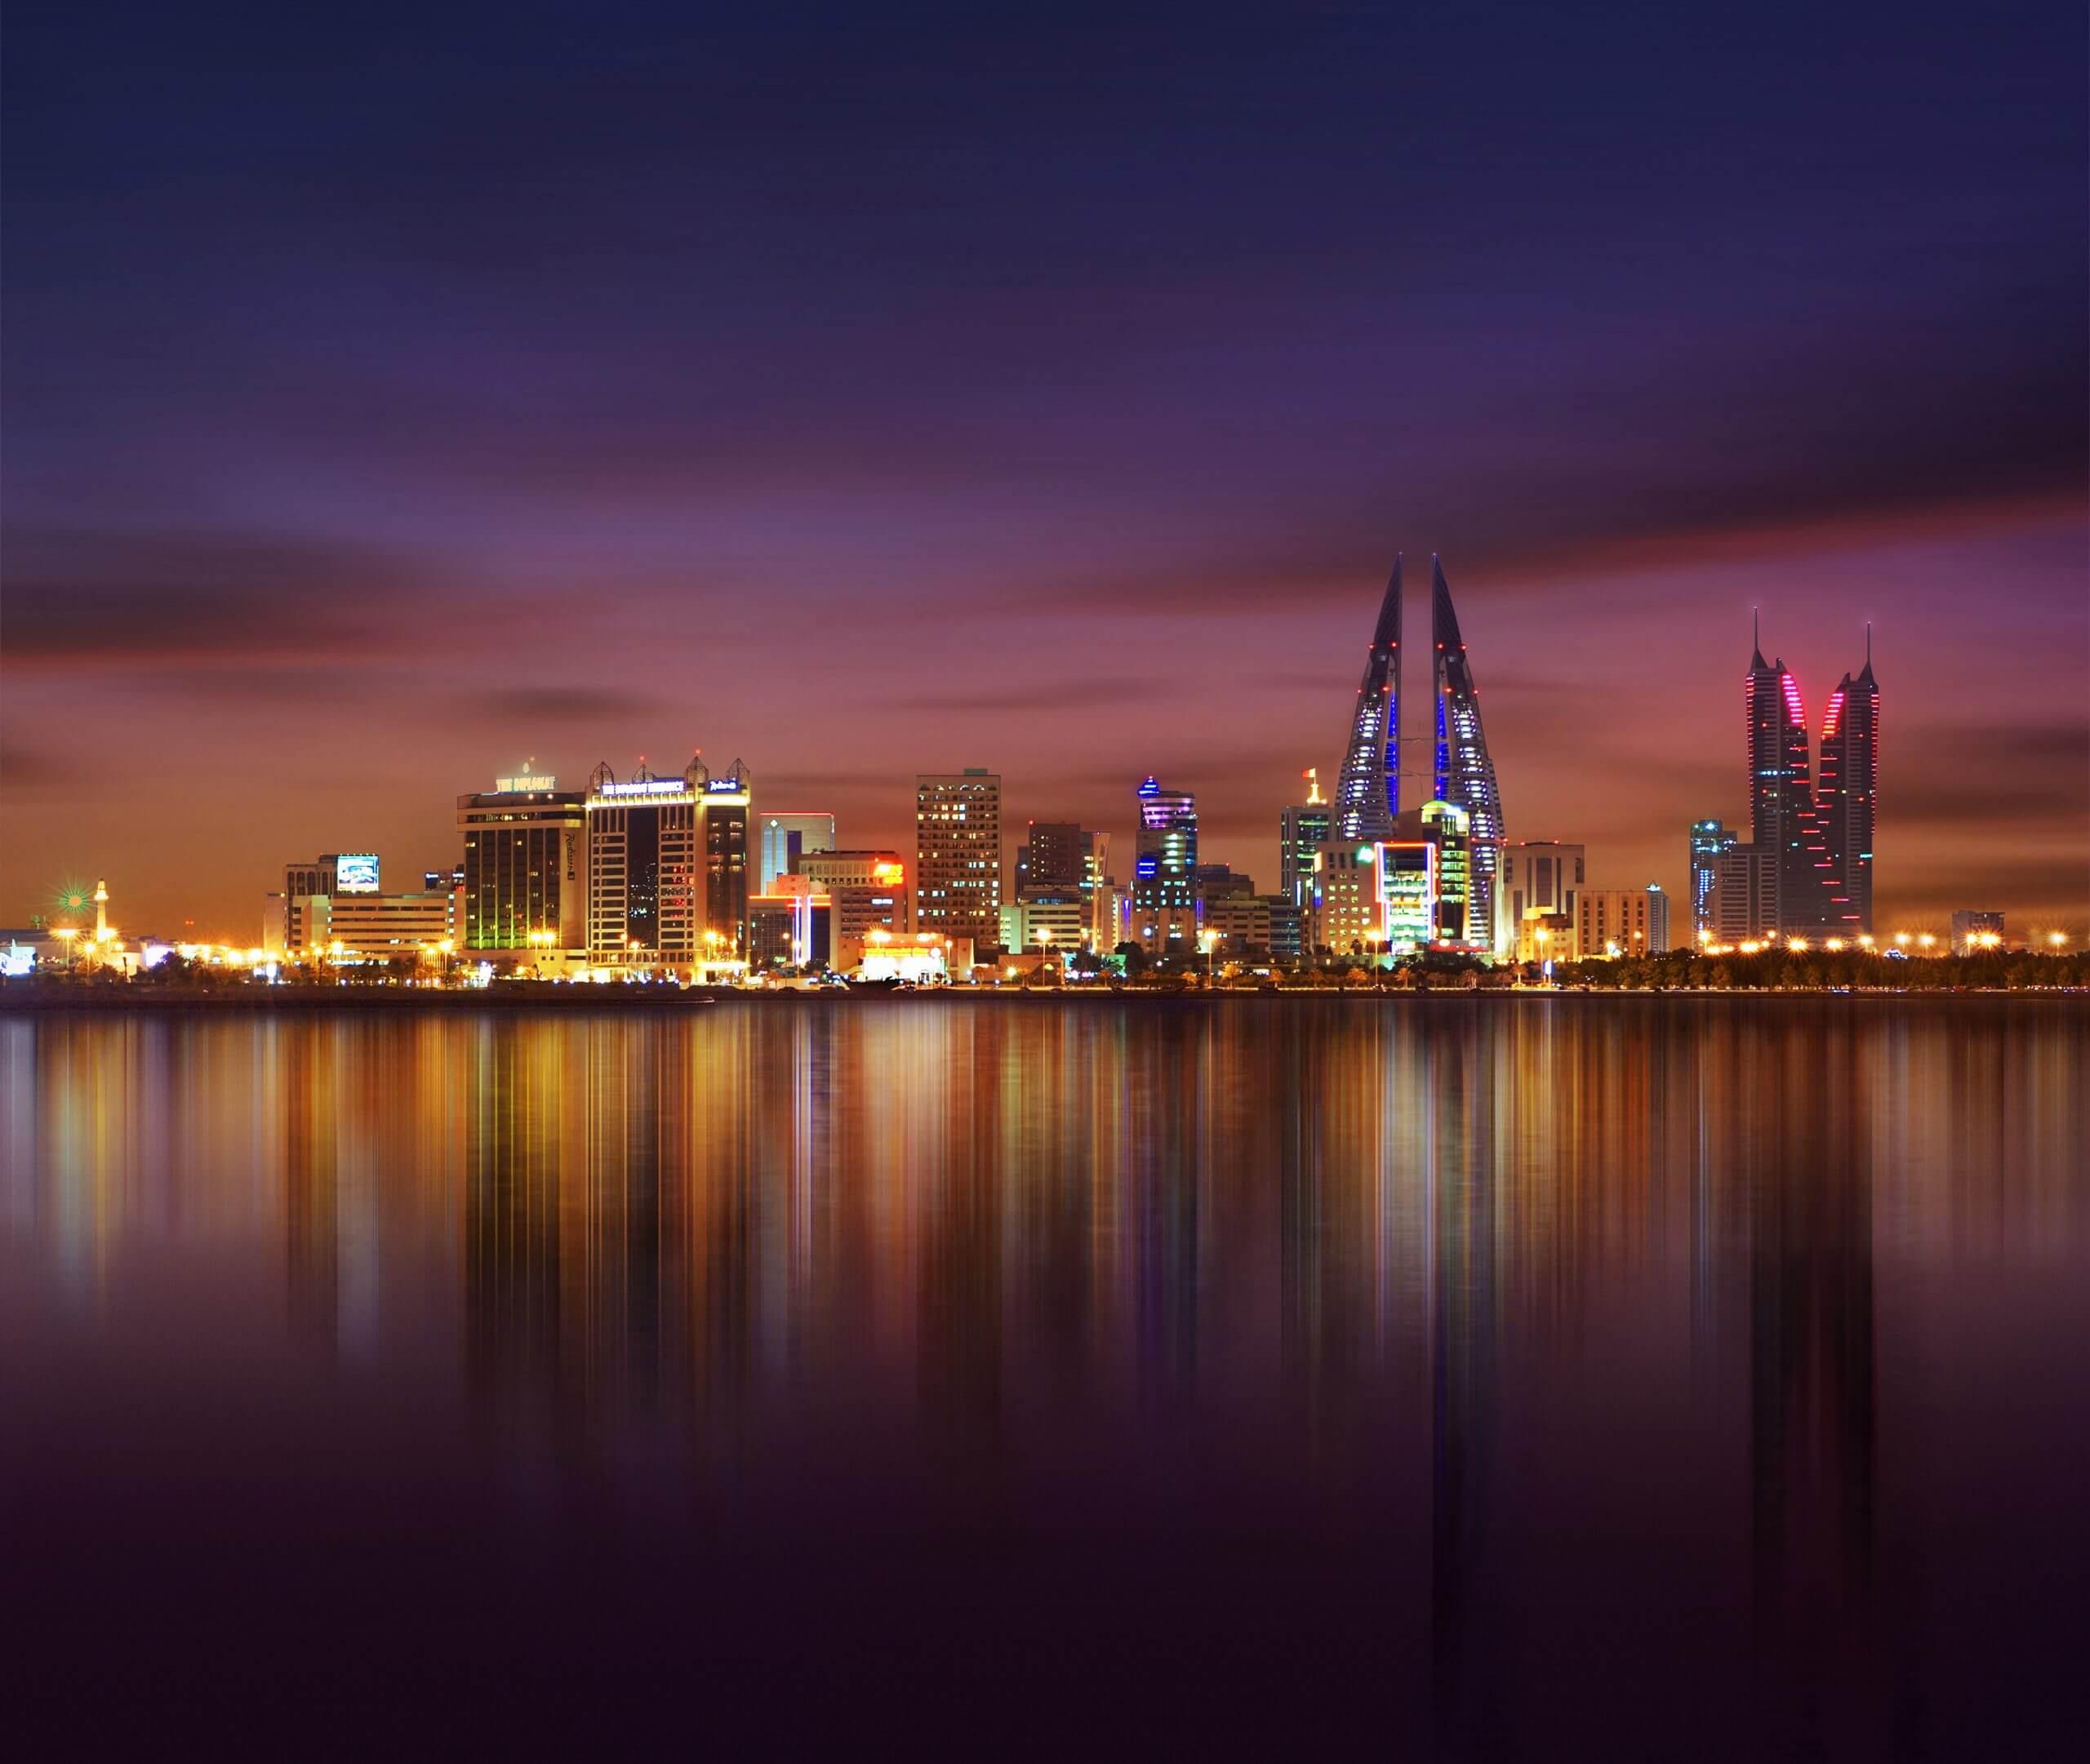 Thomson Reuters launch Venture Capital Report on Economic Development in Bahrain